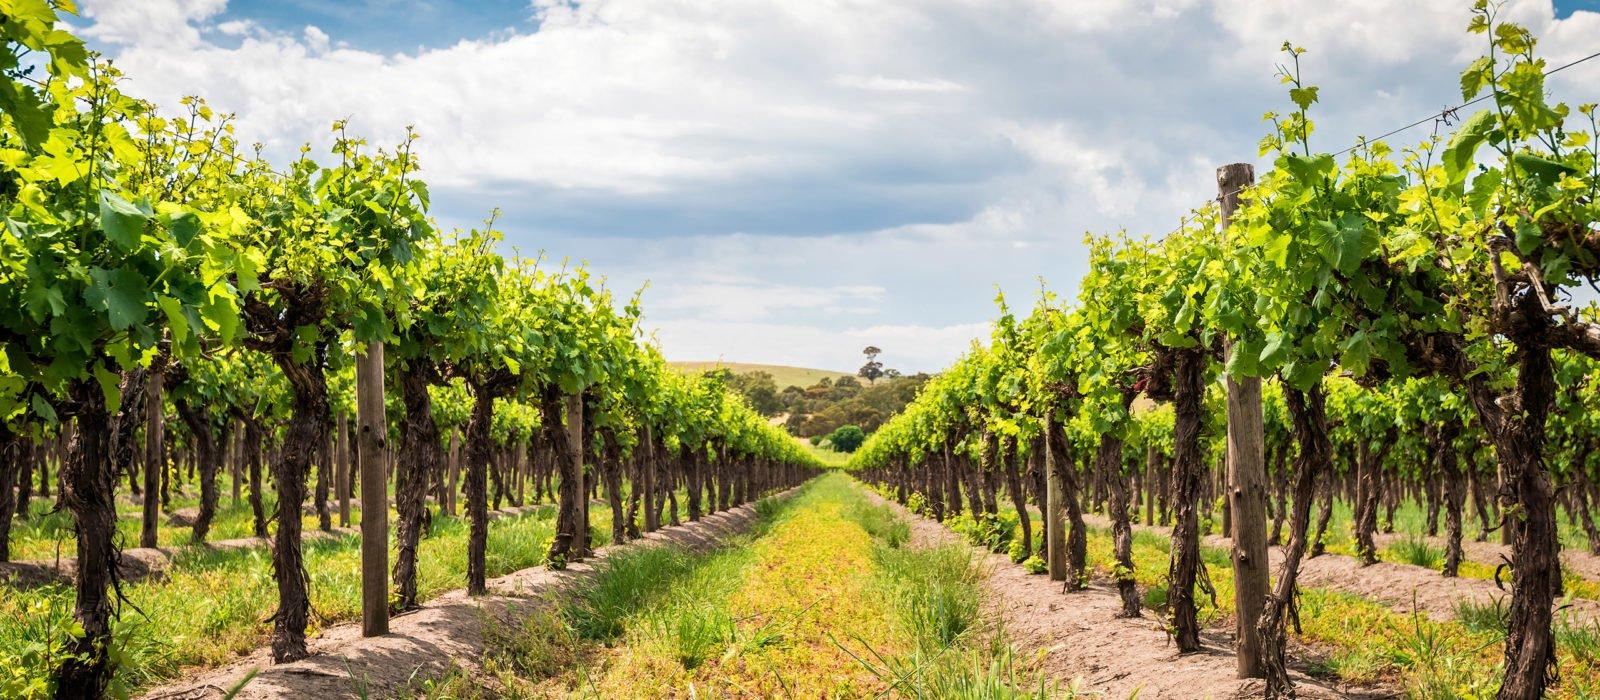 vineyard-barossa-valley-australia